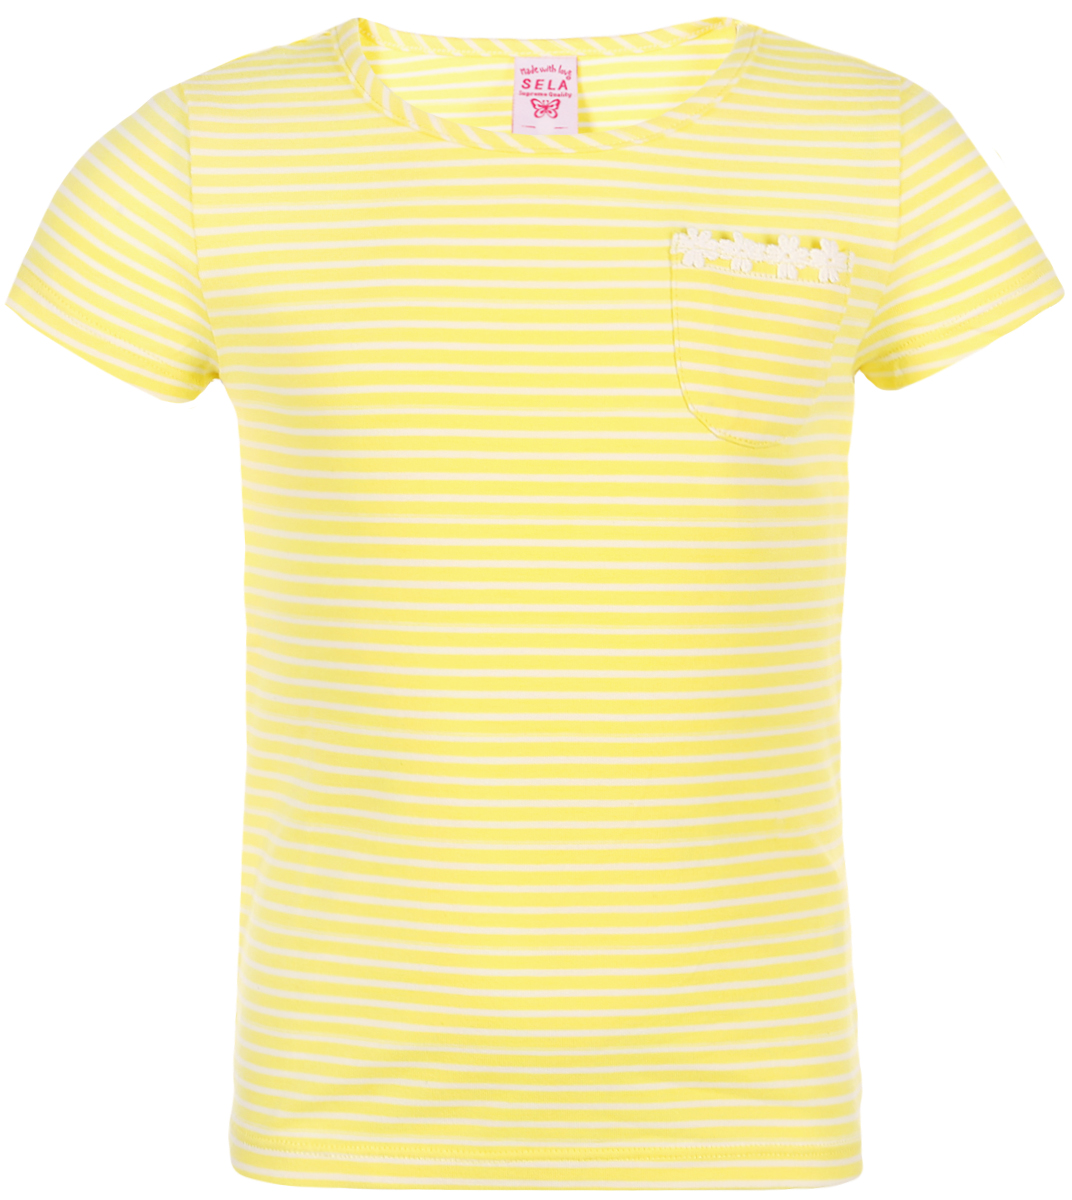 Футболка для девочки Sela, цвет: желтый. Ts-511/489-8223. Размер 116 цена